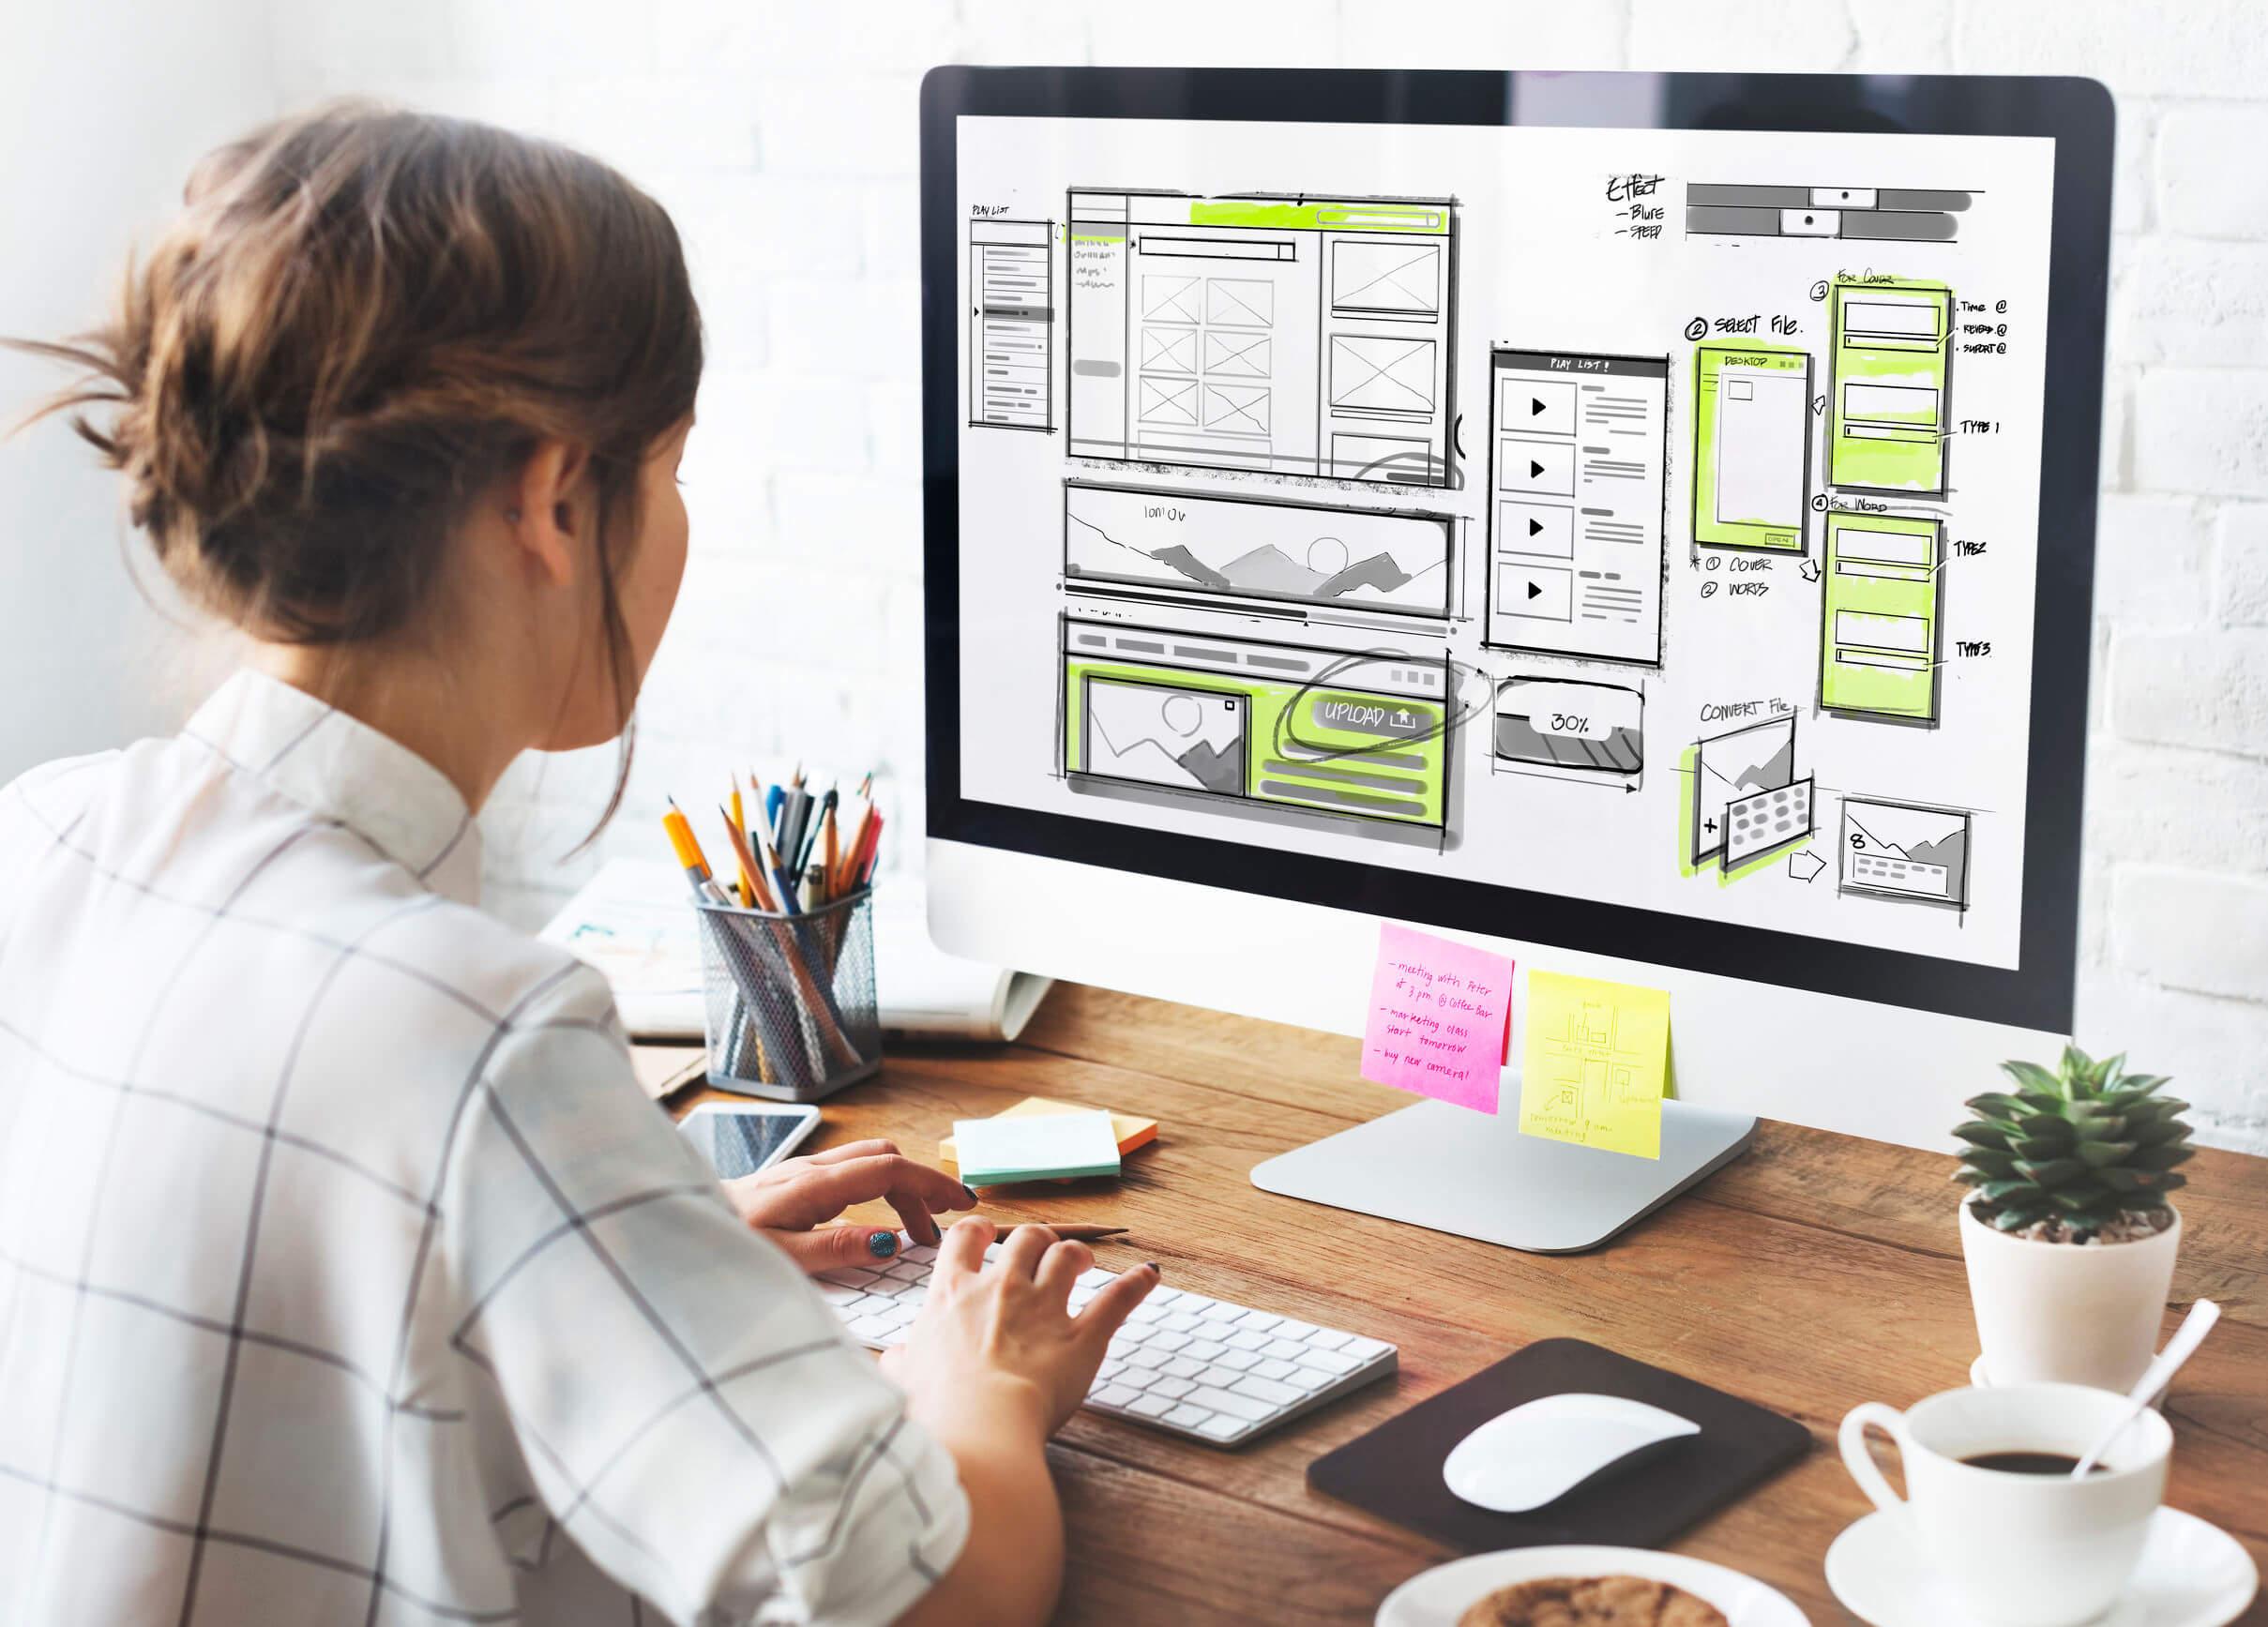 minneapolis internet marketing and web design